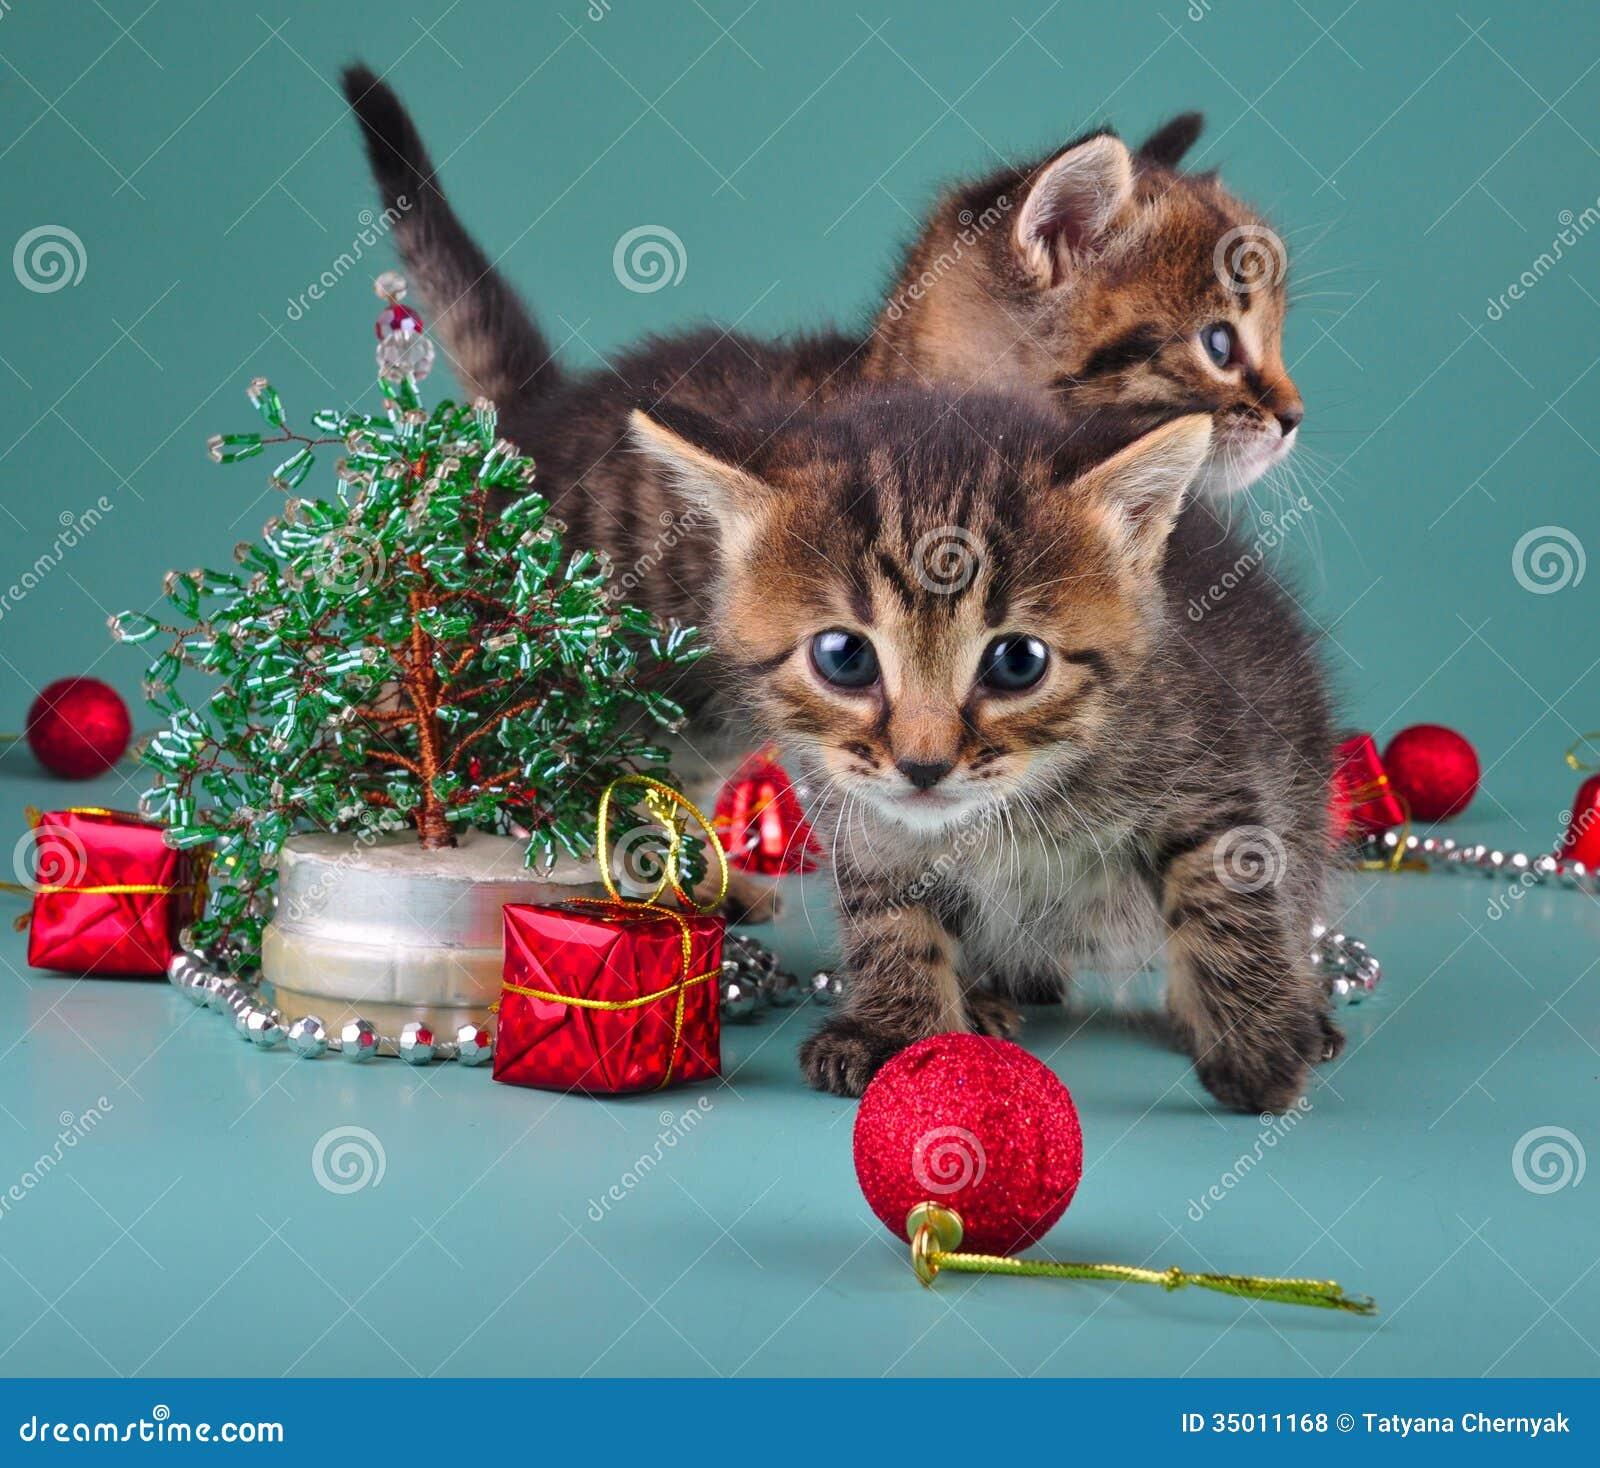 Immagini Di Natale Da Scaricare Gratis Ob04 Regardsdefemmes